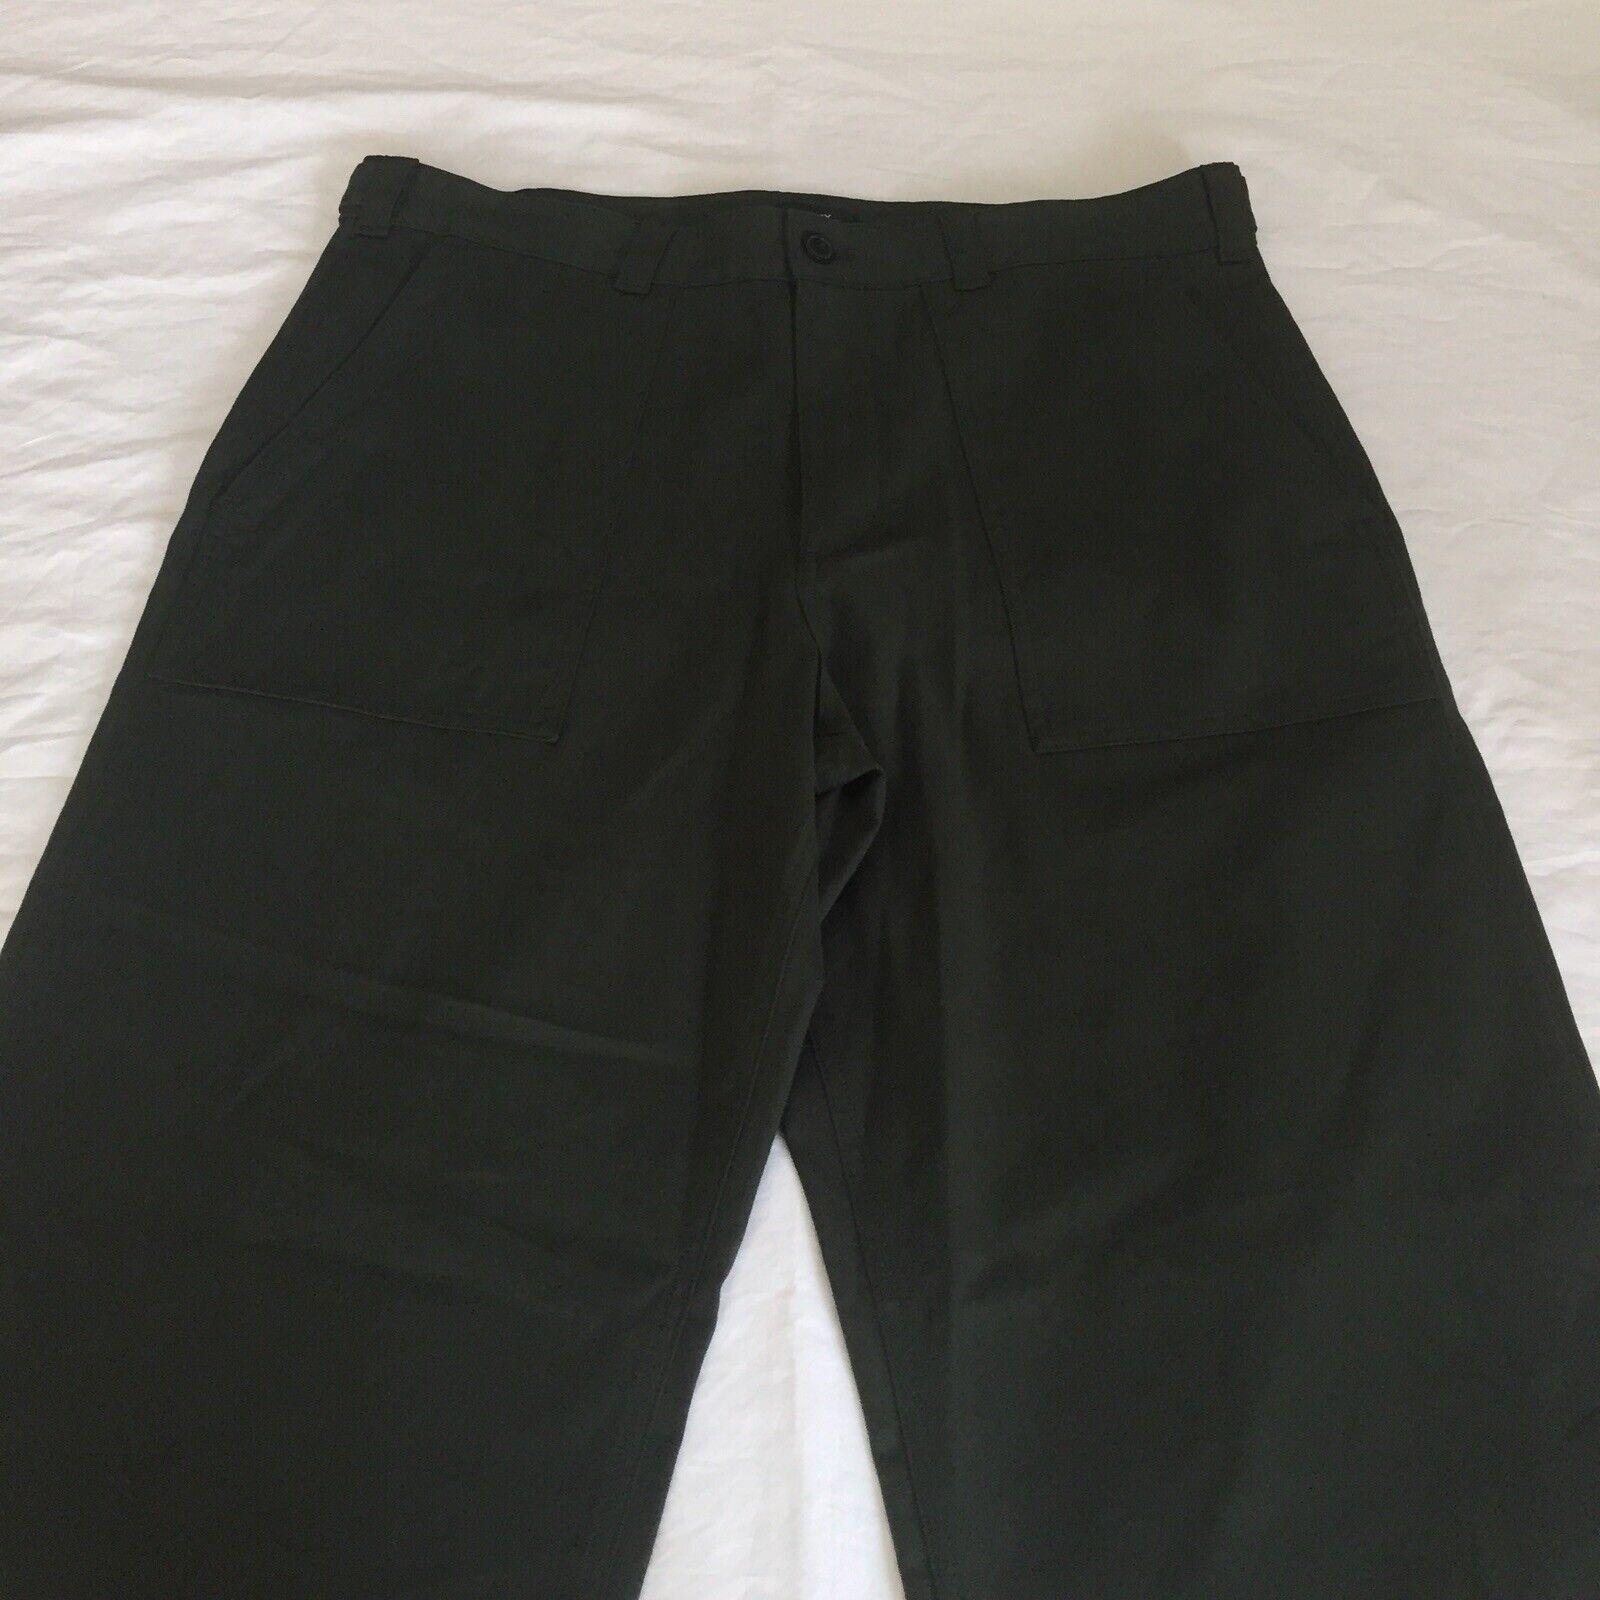 Theory Solid Modern Fatigue Canvas Pants Dark Green Straight Leg Mens 36